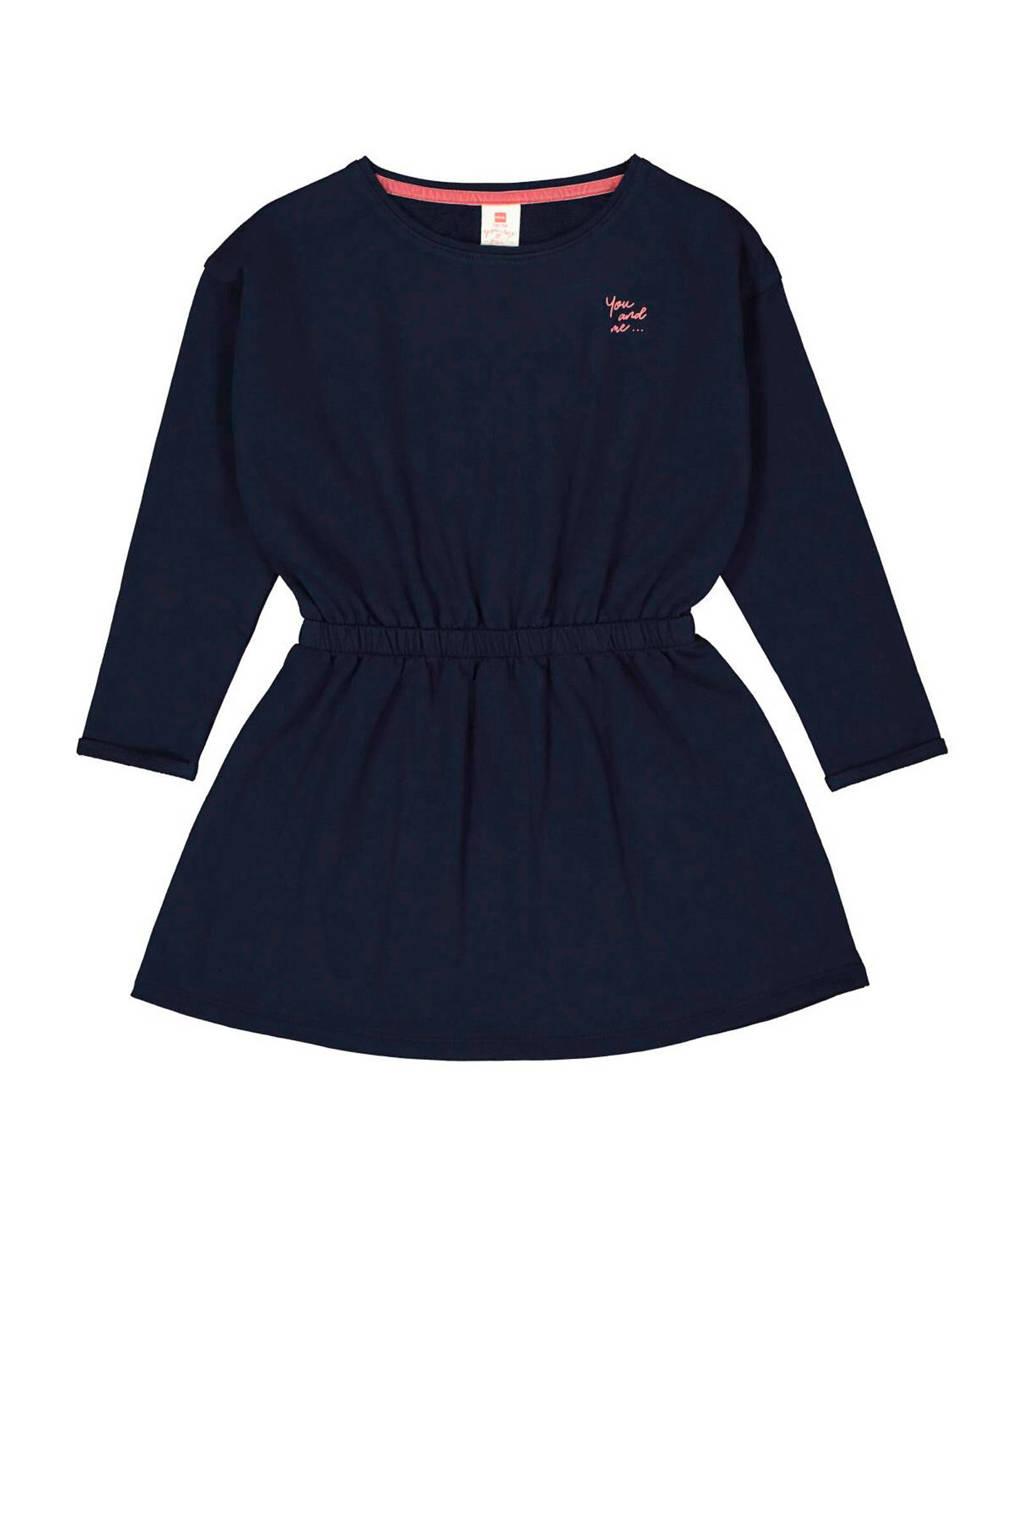 HEMA jersey jurk Dieuwertje met tekst donkerblauw, Donkerblauw